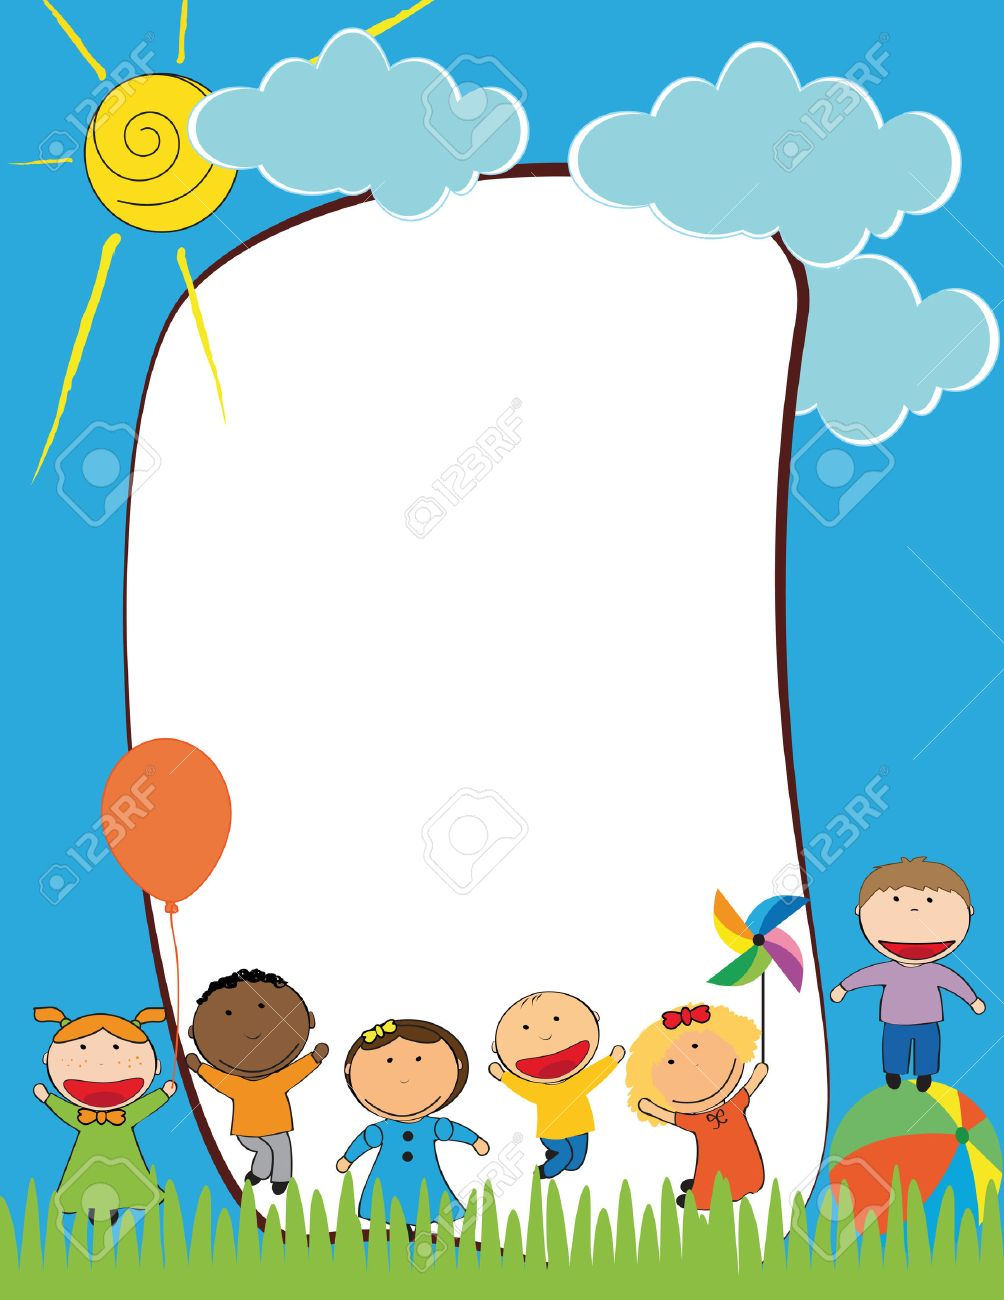 Children Photo Frame - Page 5 - Frame Design & Reviews ✓